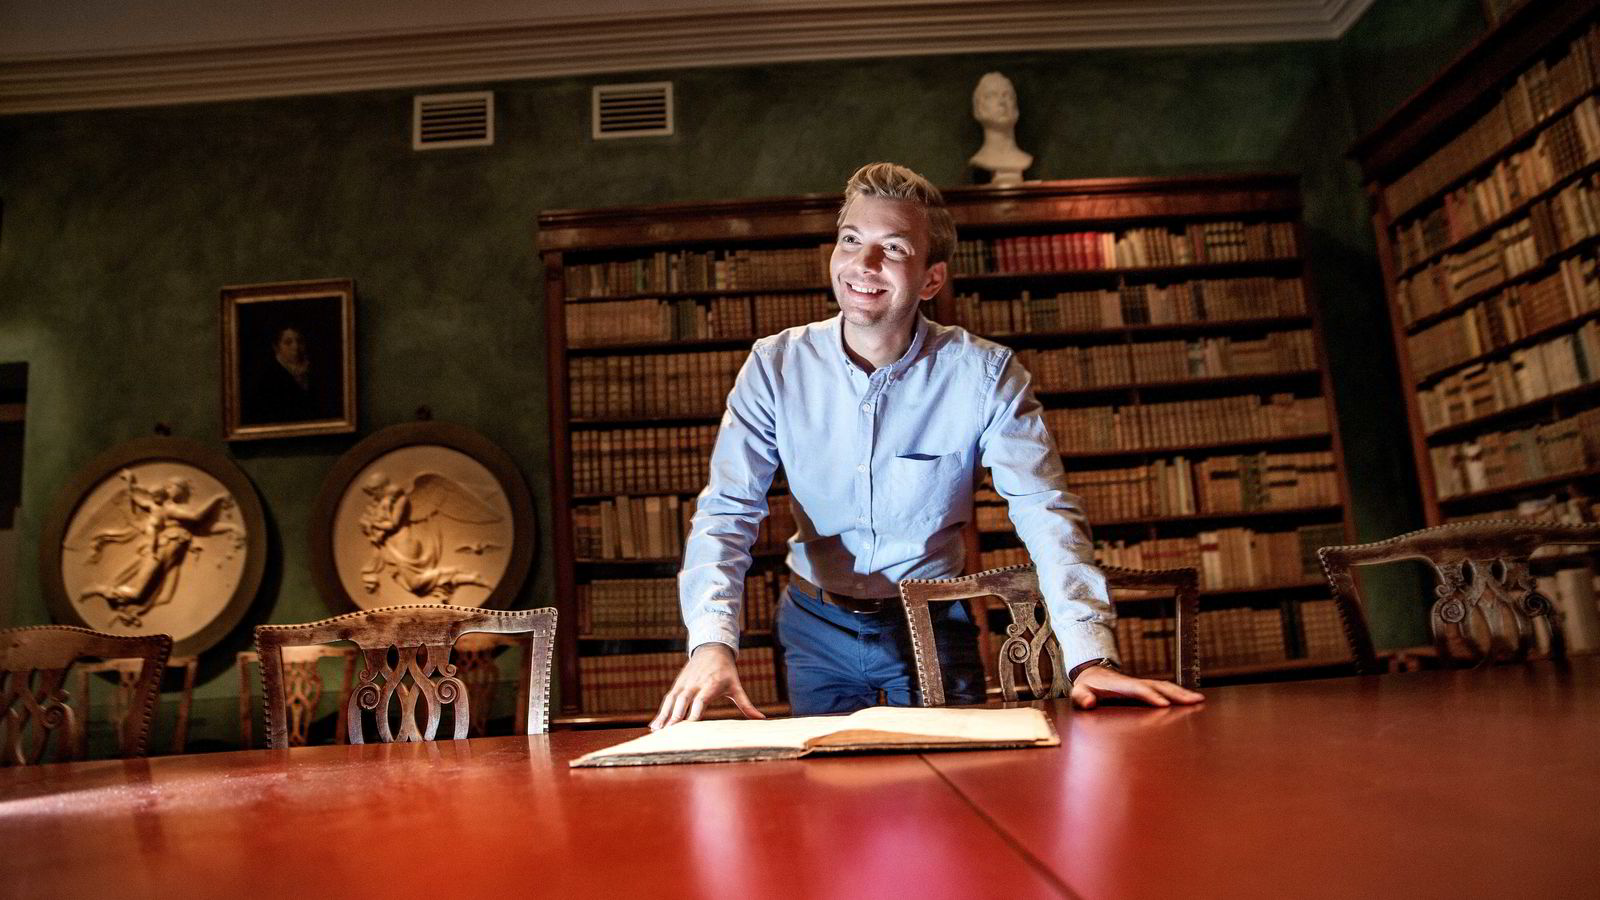 Alexander Nietzold er gründer i det norske selskapet Tind som tilbyr ekstremt sikker lagring av f.eks forskningsmateriell.                Her ser Nietzold i gamle bøker i Knudtzonsalen ved Gunnerusbiblioteket ved NTNU.               Foto: